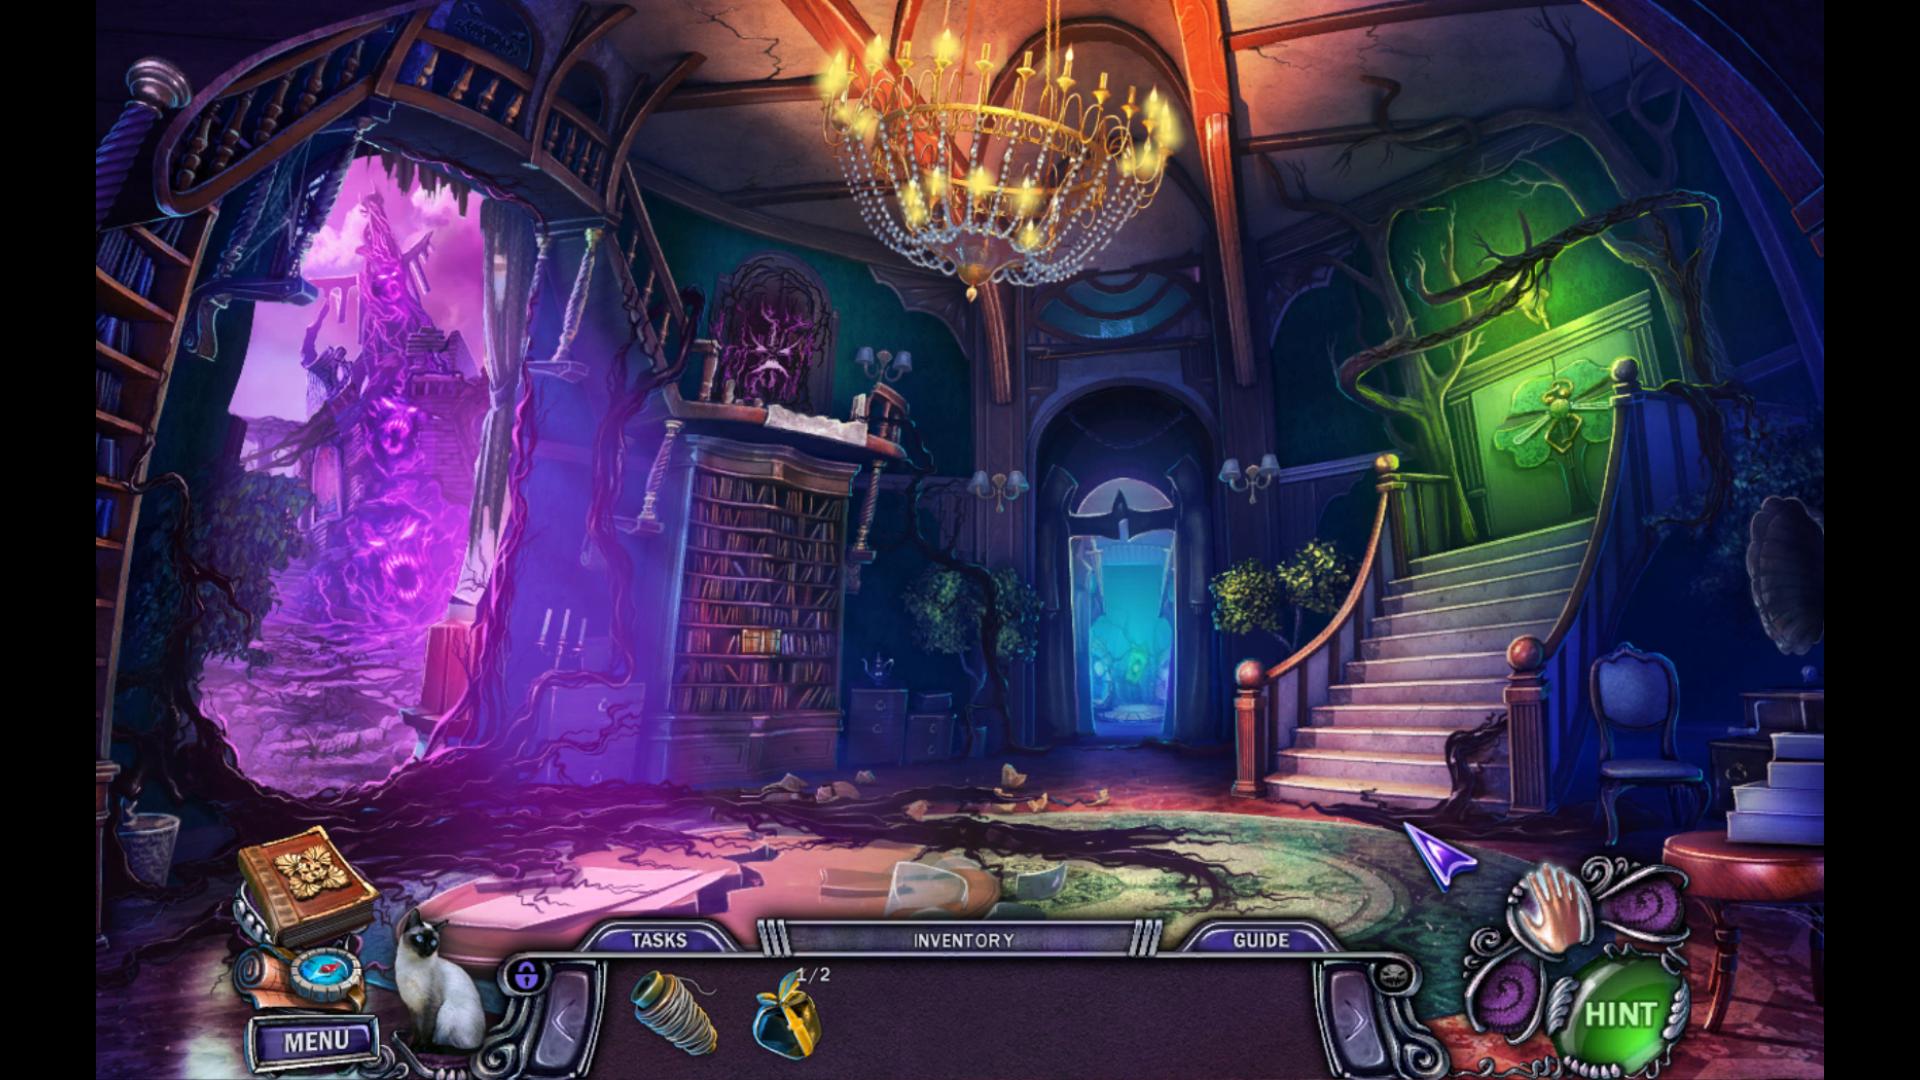 Screenshot from House of 1000 Doors: Evil Inside (9/9)